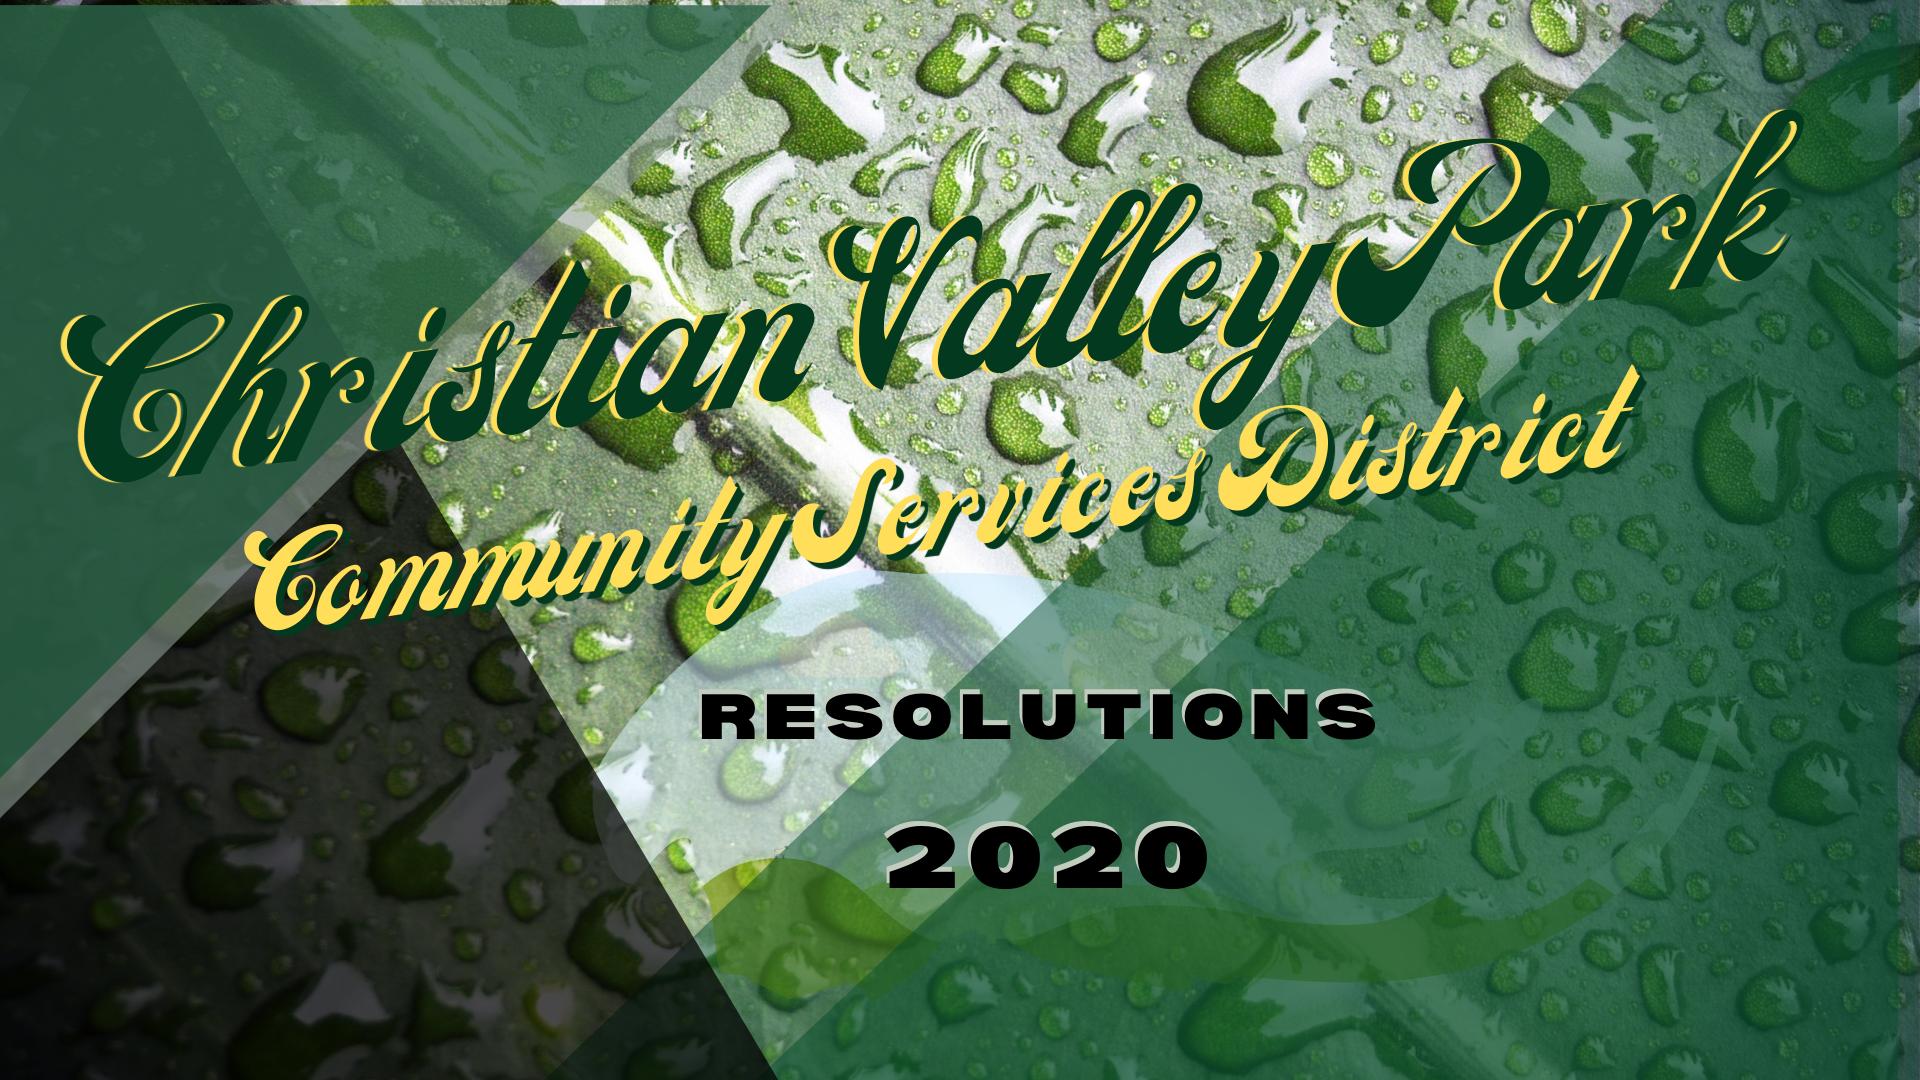 Christian Valley Park CSD RESOLUTIONS 2020